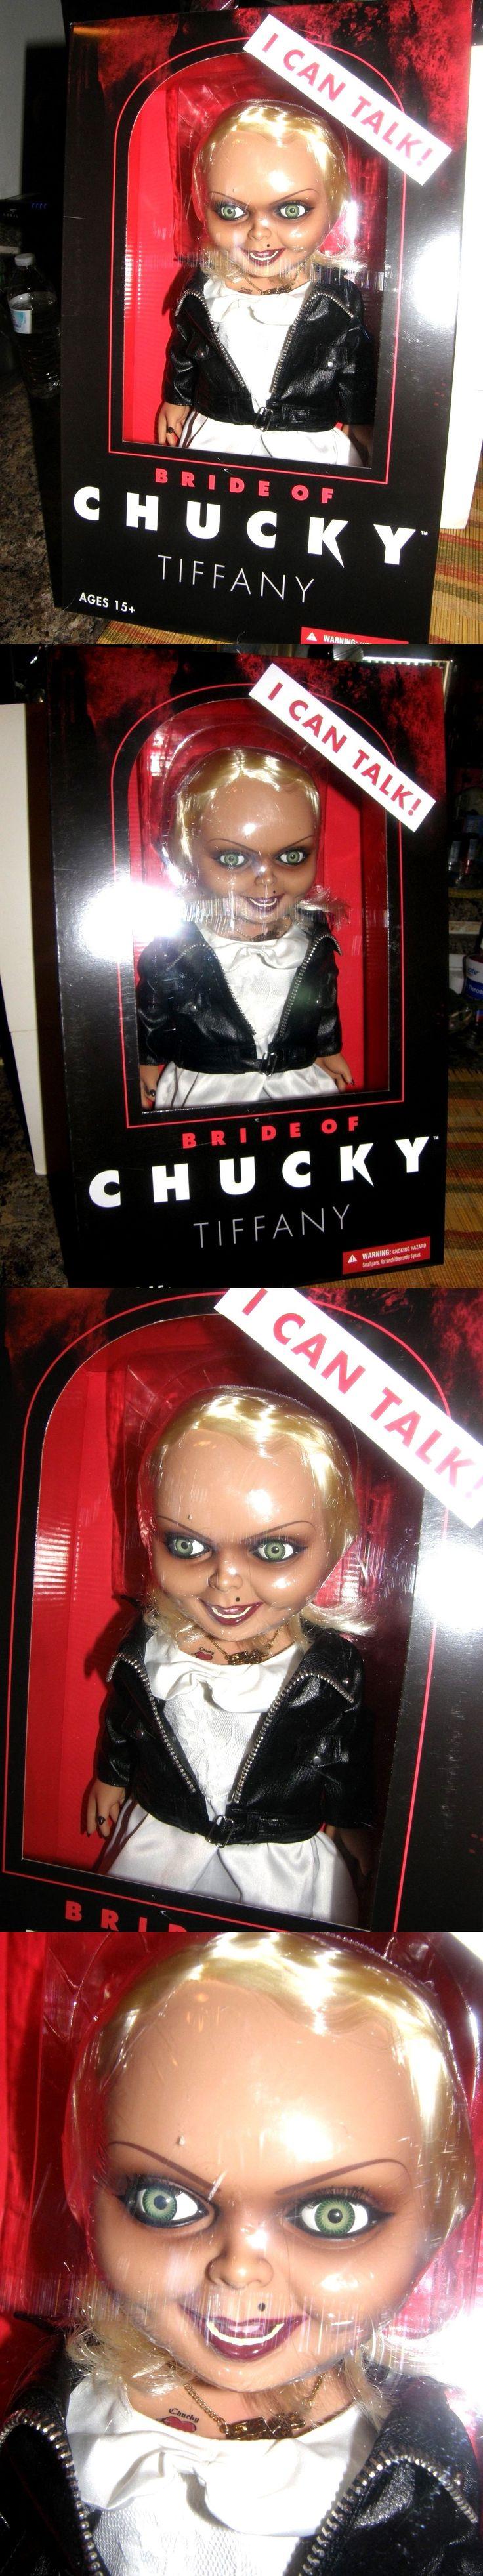 Rugrats 2628: Bride Of Chucky Tiffany Talking Tiffany Doll -> BUY IT NOW ONLY: $200 on eBay!